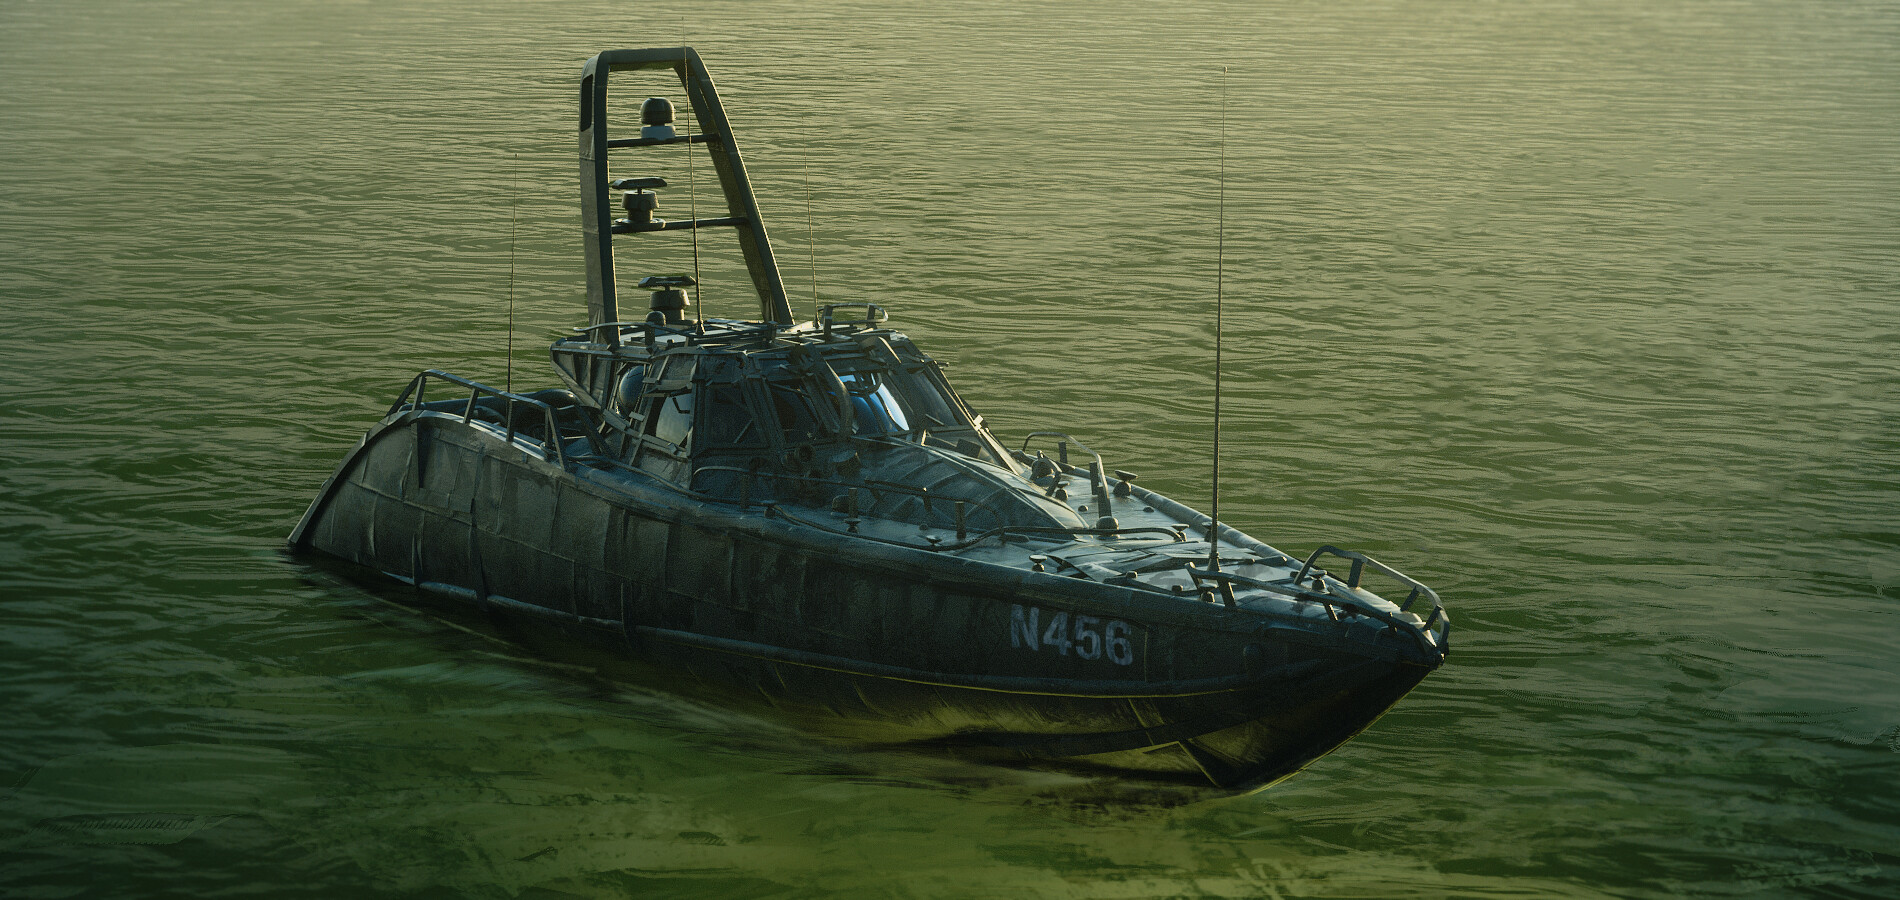 Rene aigner boat01